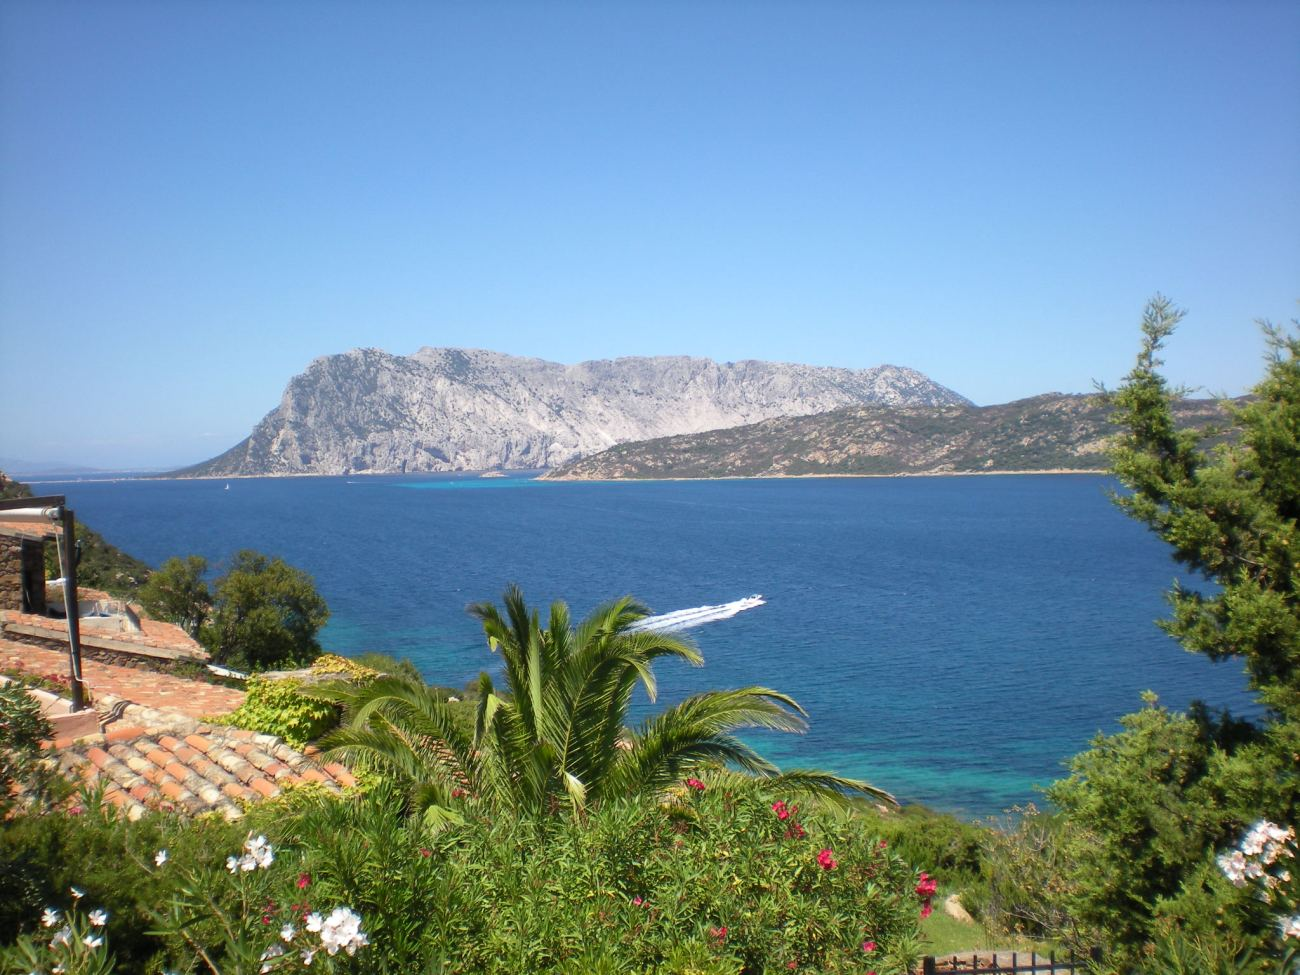 Capo Coda Cavallo, San Teodoro, Sardinia